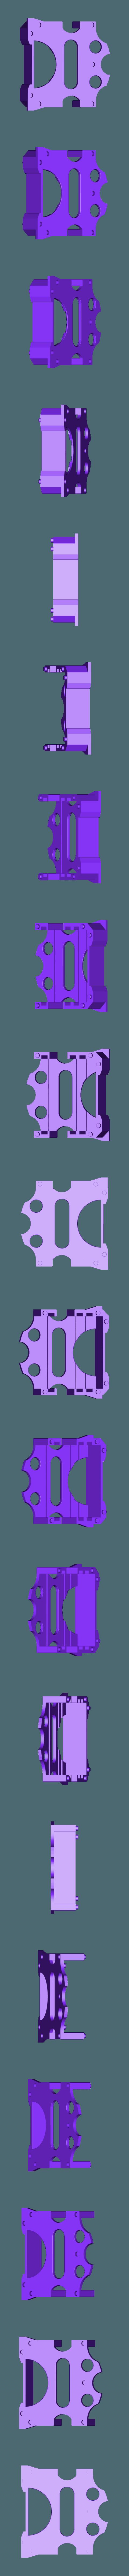 P20B.stl Download free STL file Tools modular desktop stand (Tweezer;Plier;Screwdriver) V 2.0 • Model to 3D print, ICTAvatar